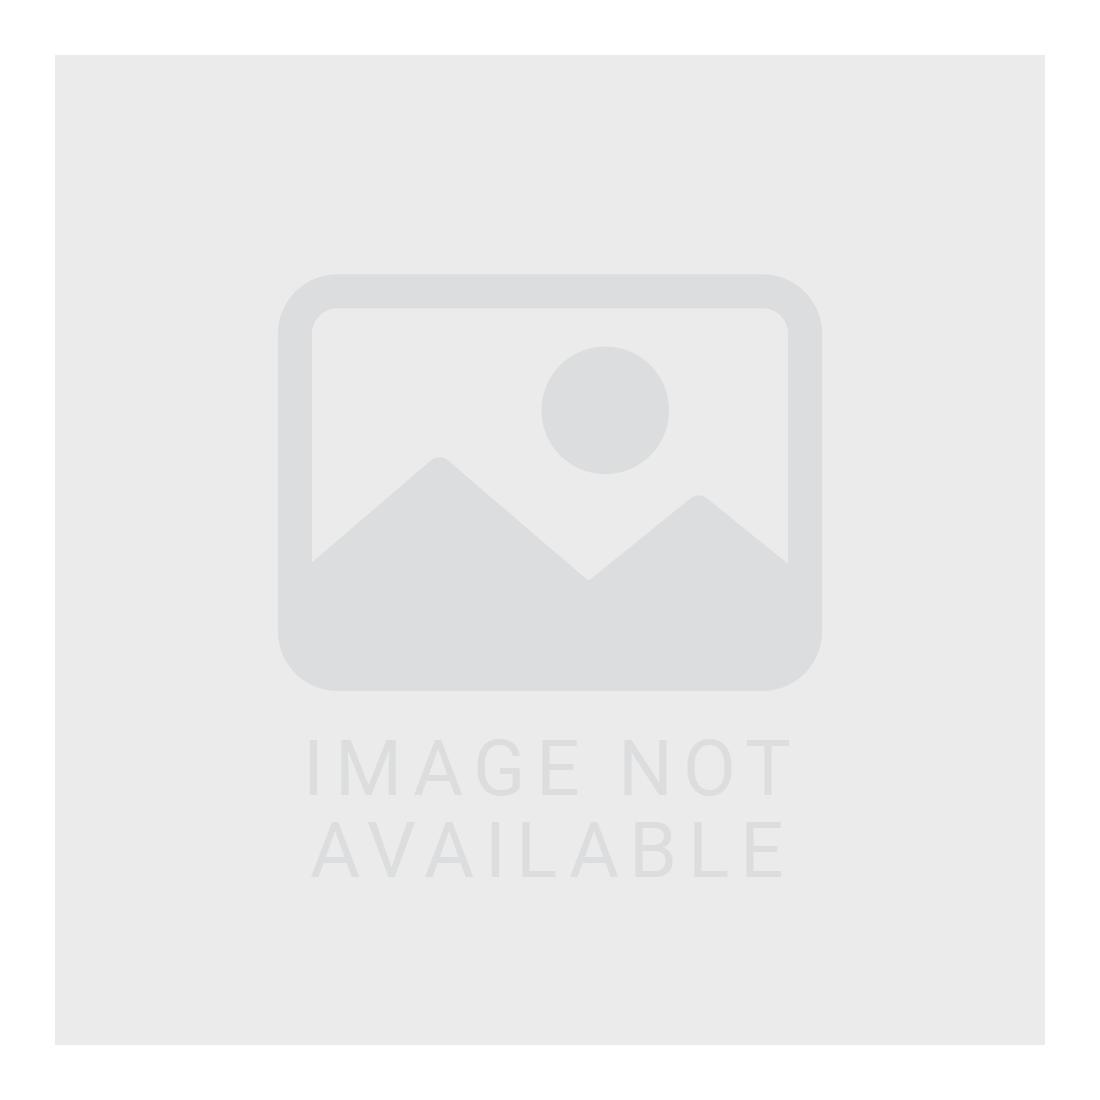 dodge hellcat redeye logo Dodge Hellcat Redeye Decal - Dodge Life